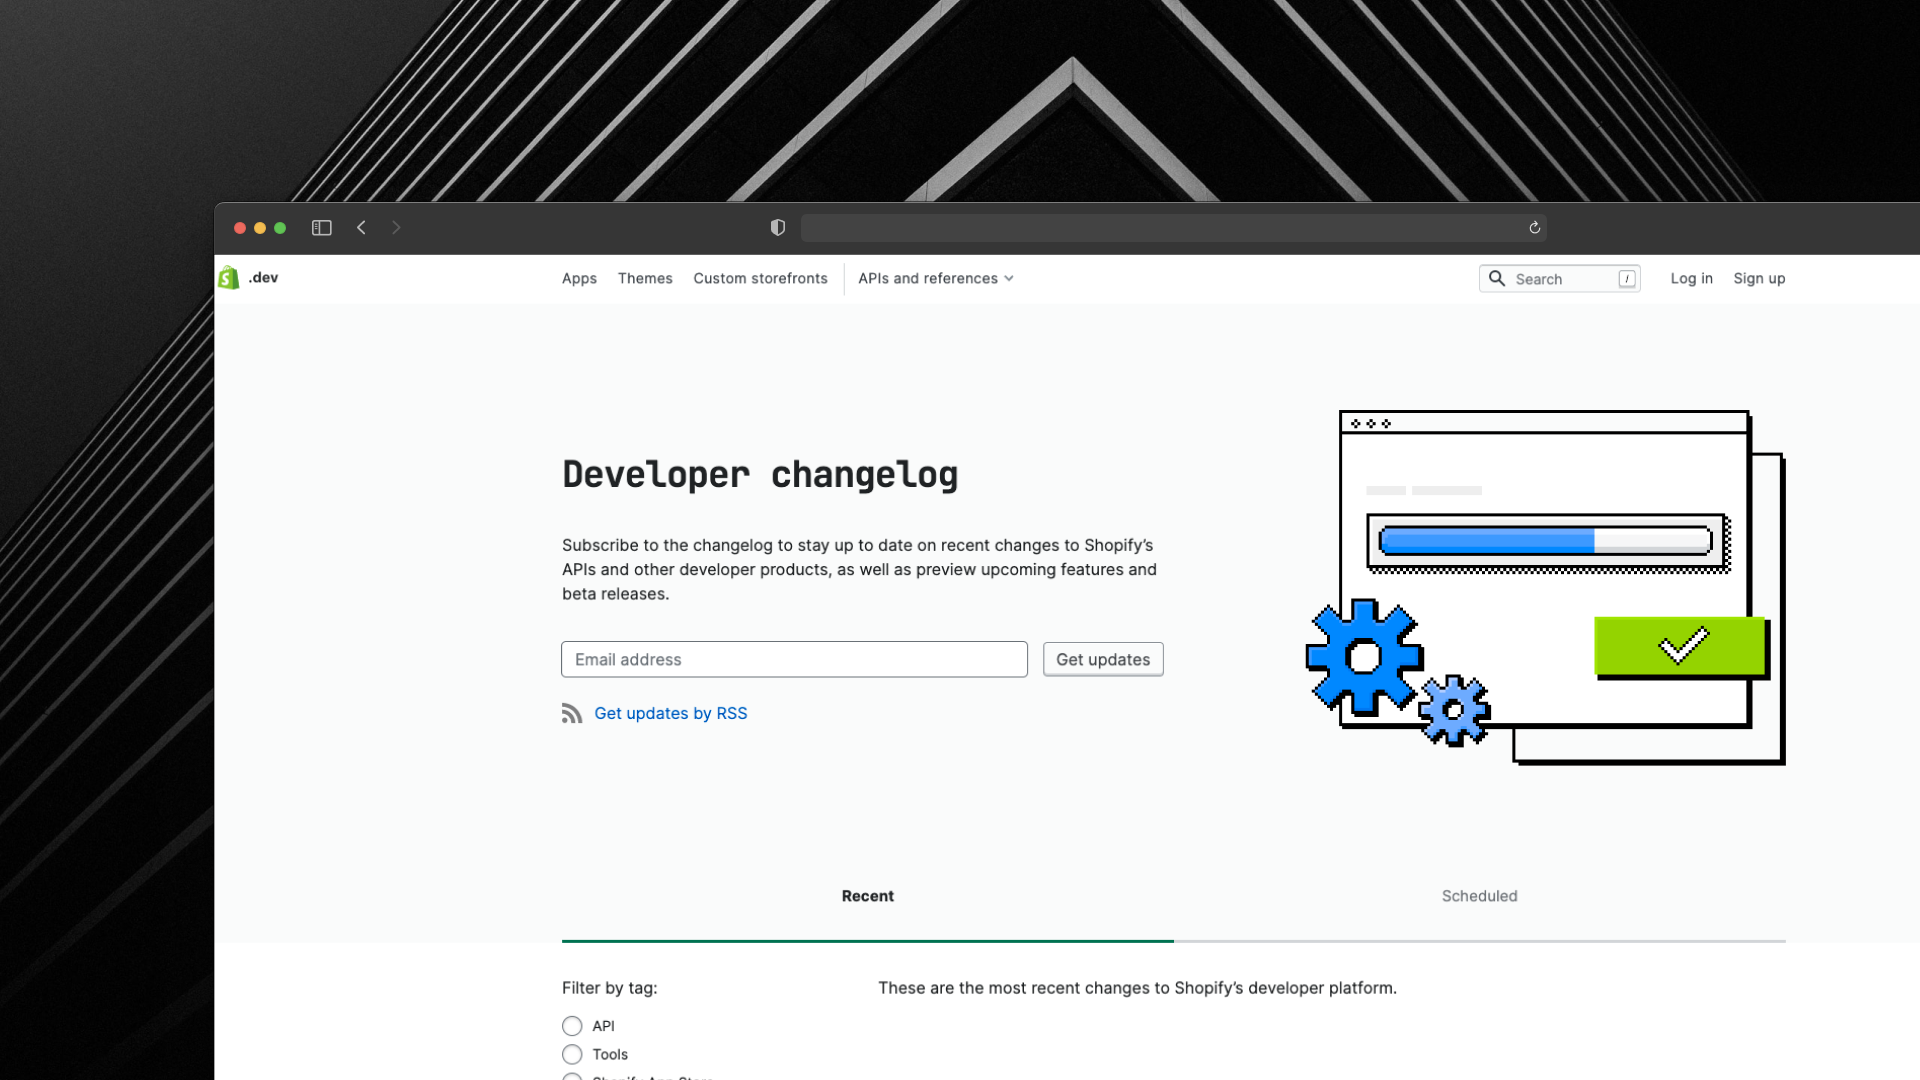 Shopify Dev Changelog Screenshot